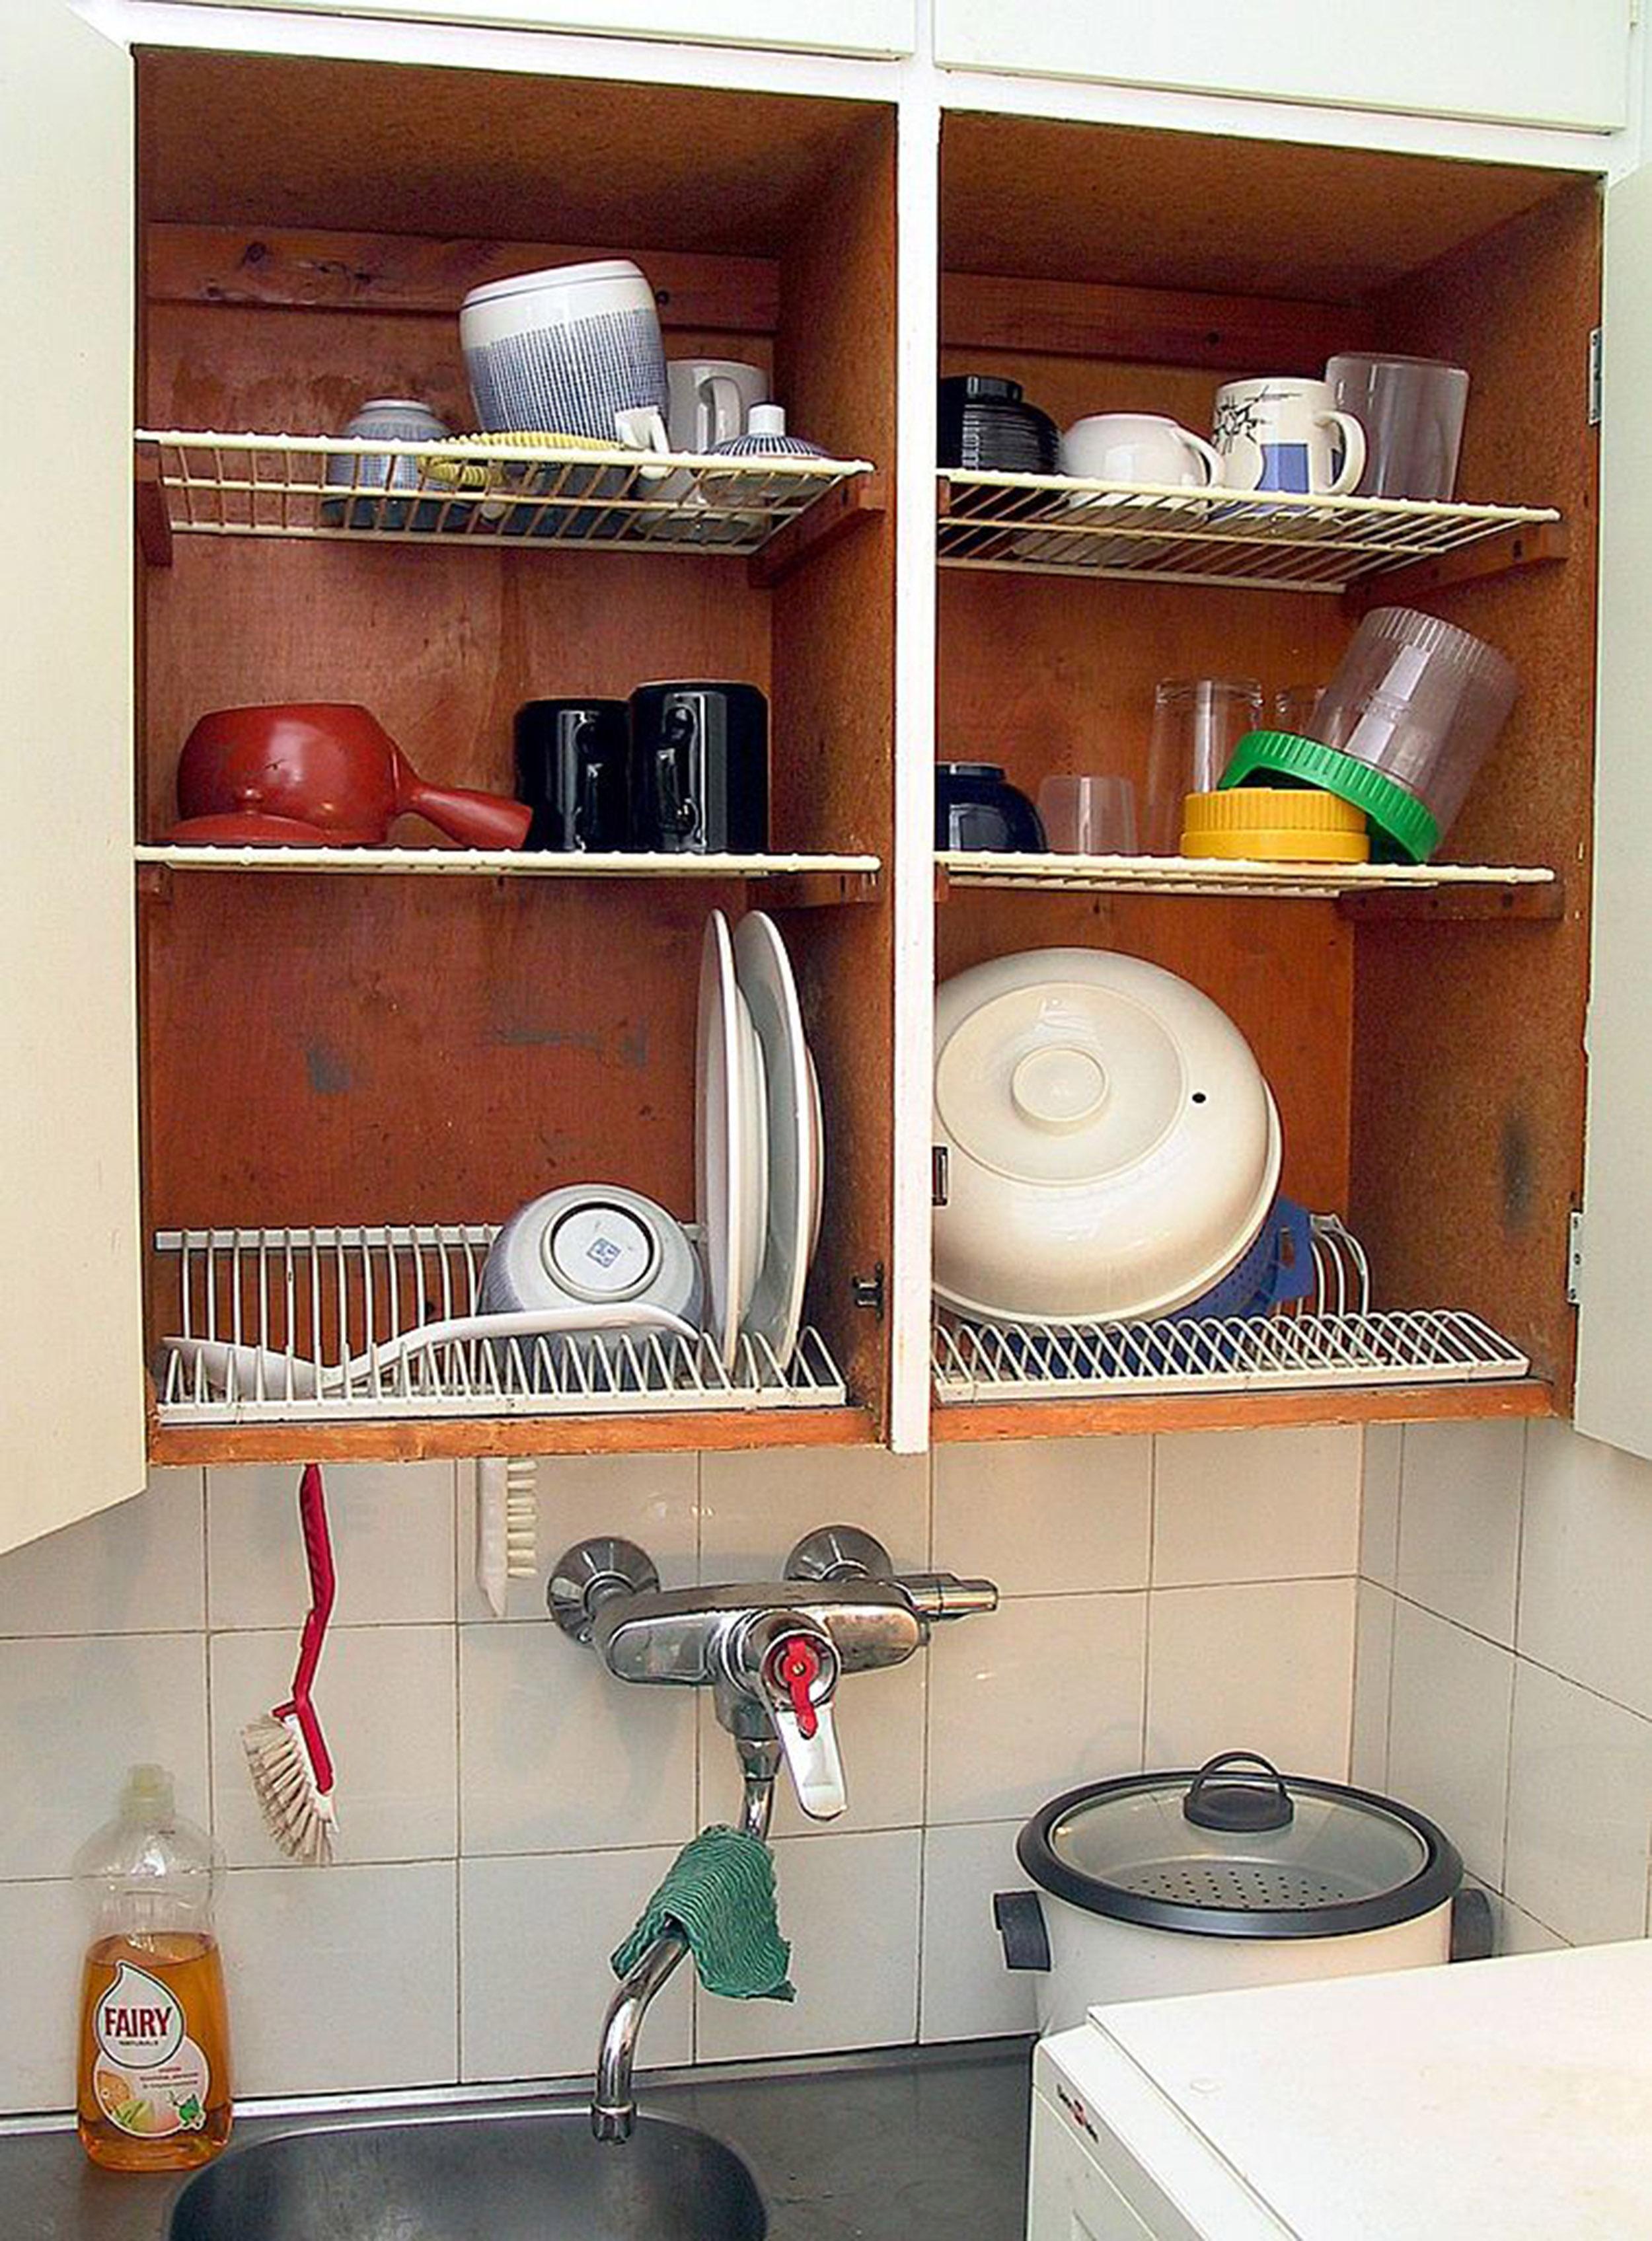 the finnish dish drying method you need